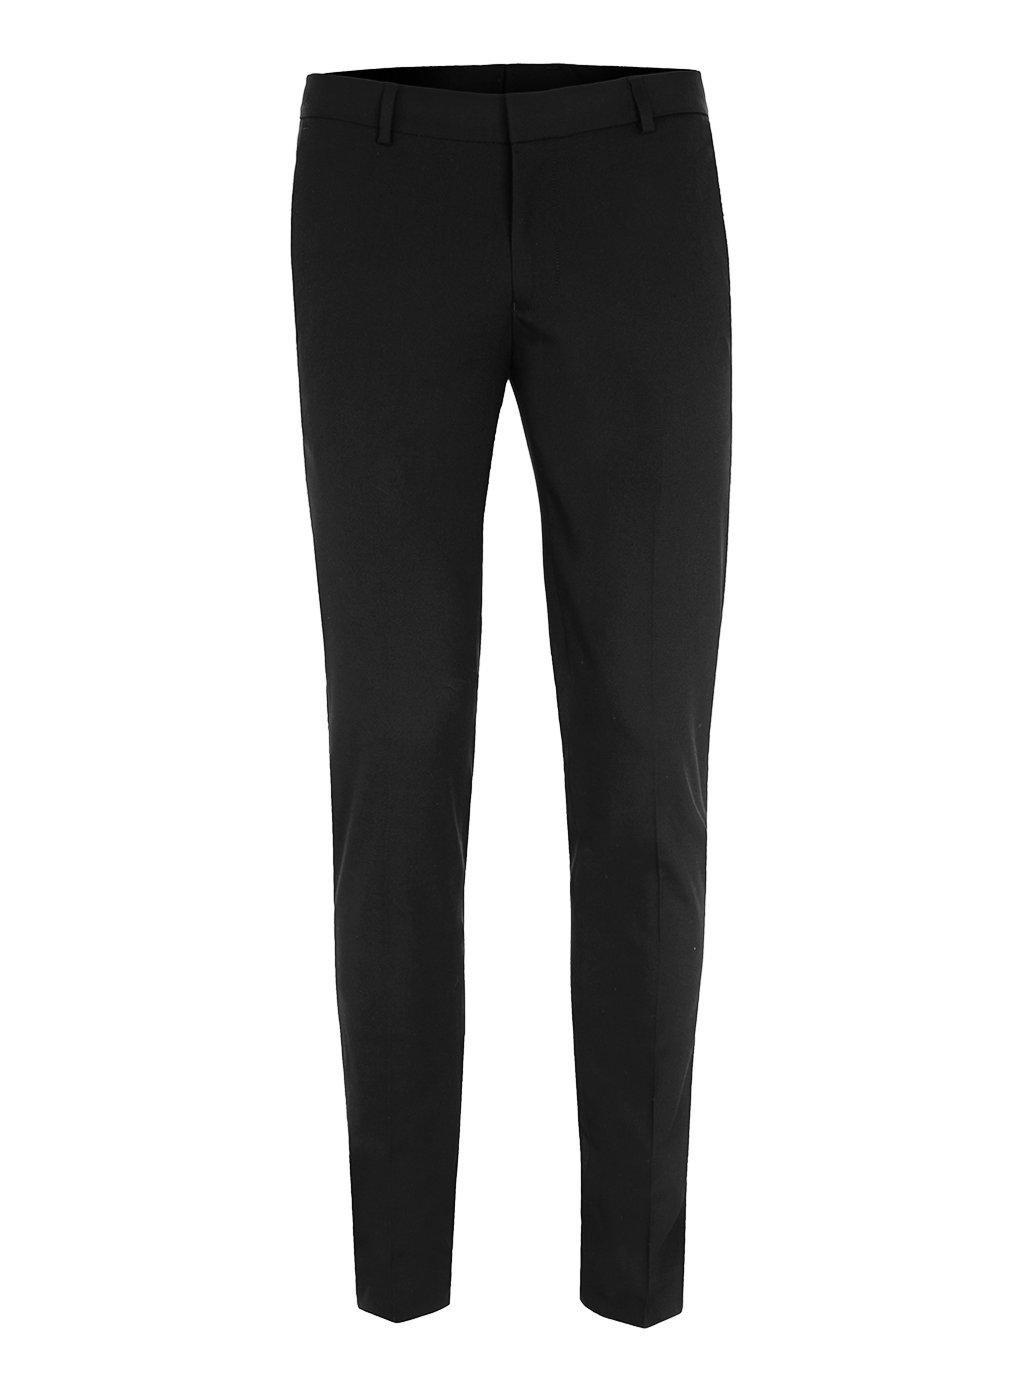 Black Ultra Skinny Fit Dress Pants